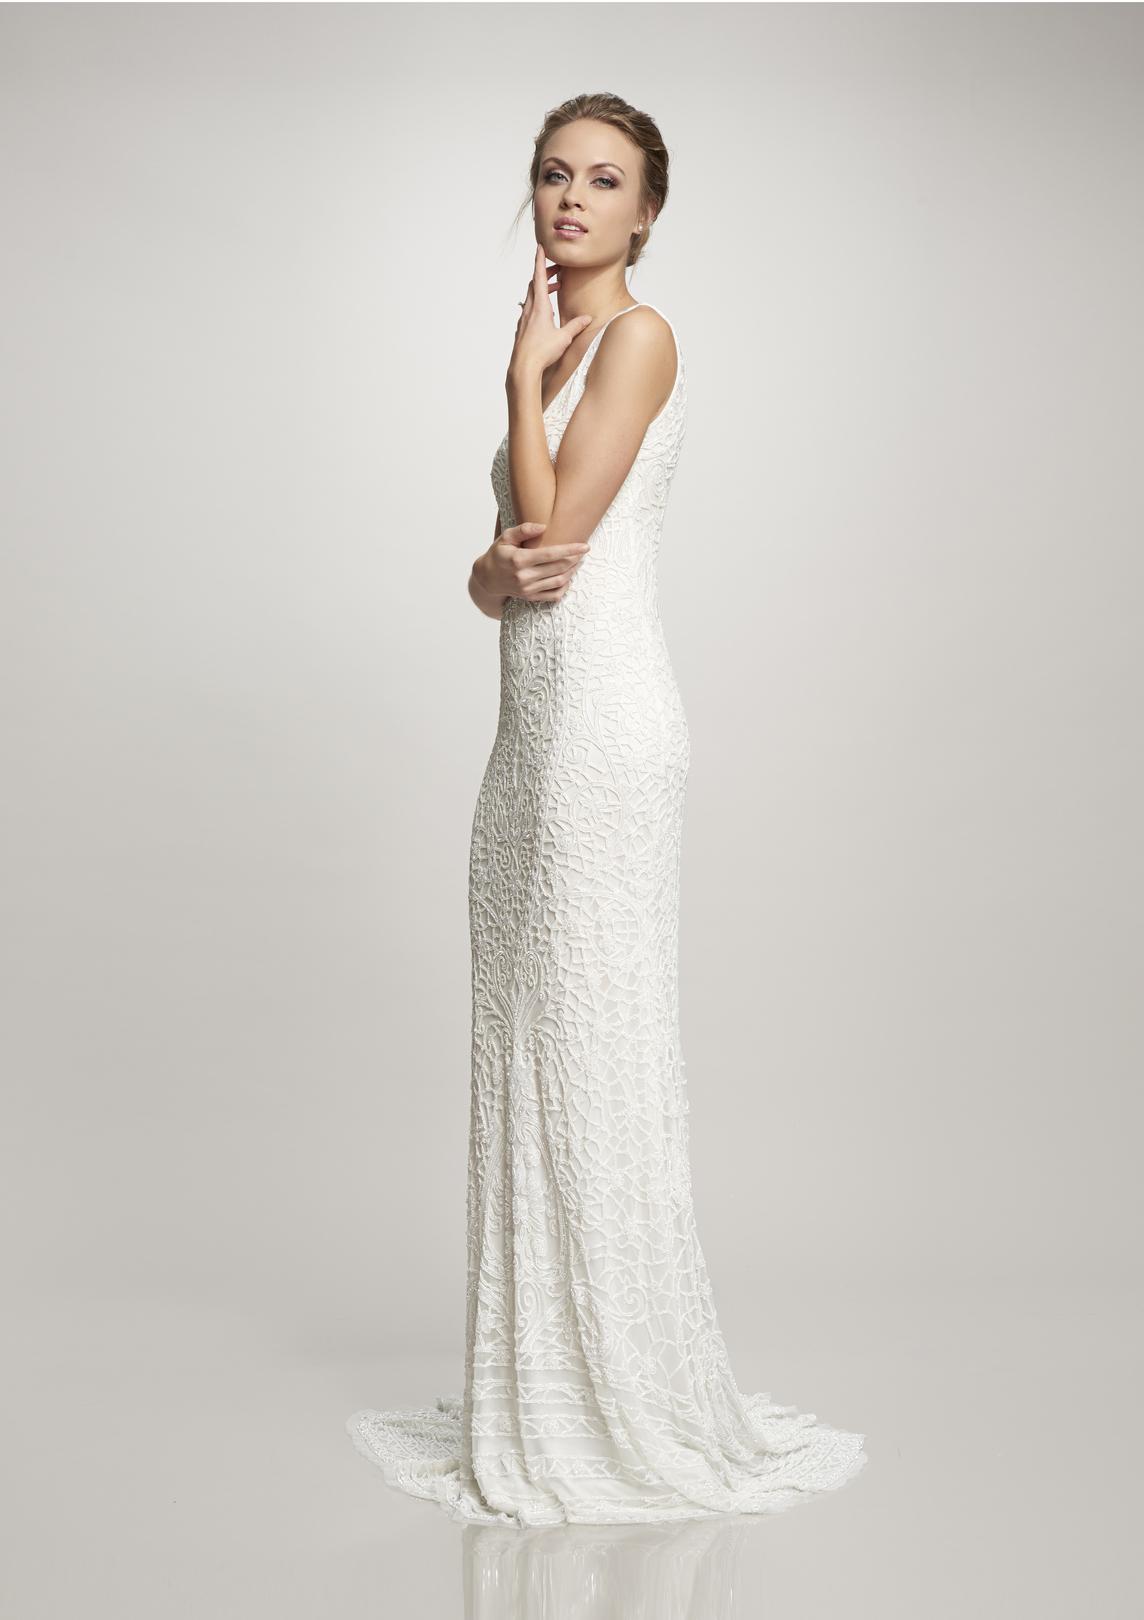 890221 karolina  dress photo